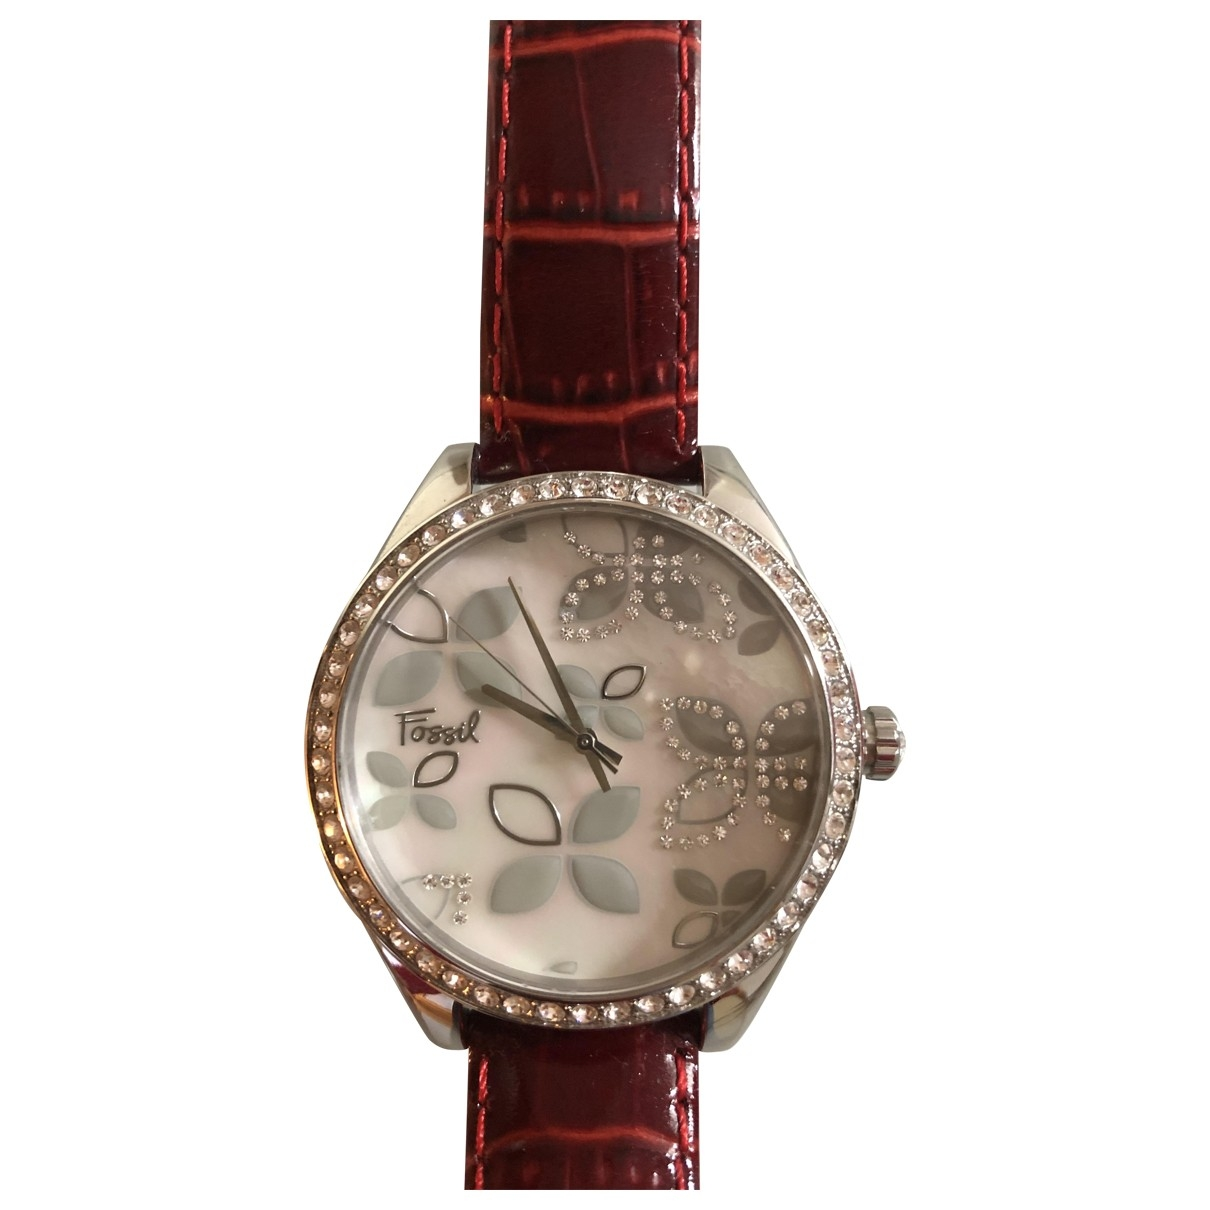 Fossil \N Burgundy Steel watch for Women \N